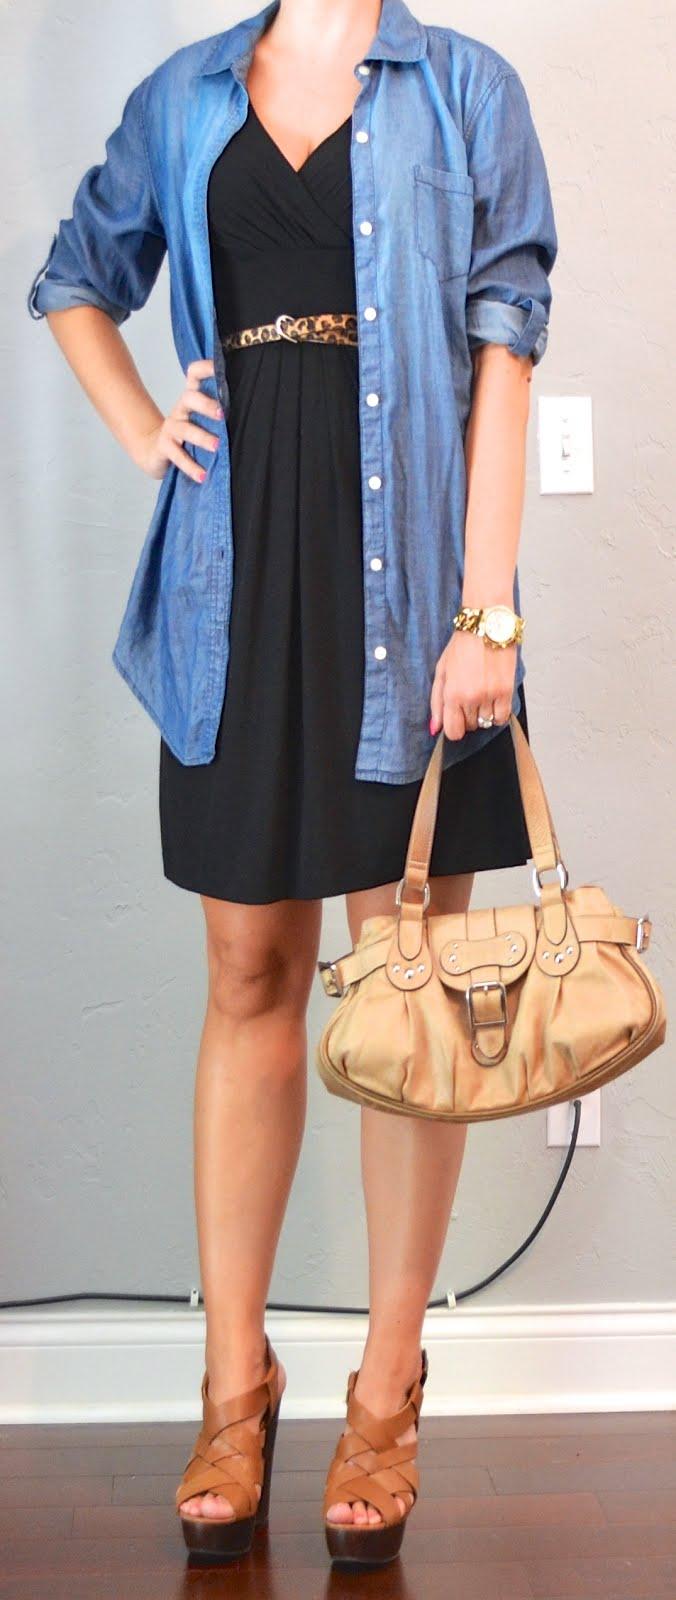 Outfit Post Black Dress Chambray Shirt Leopard Belt